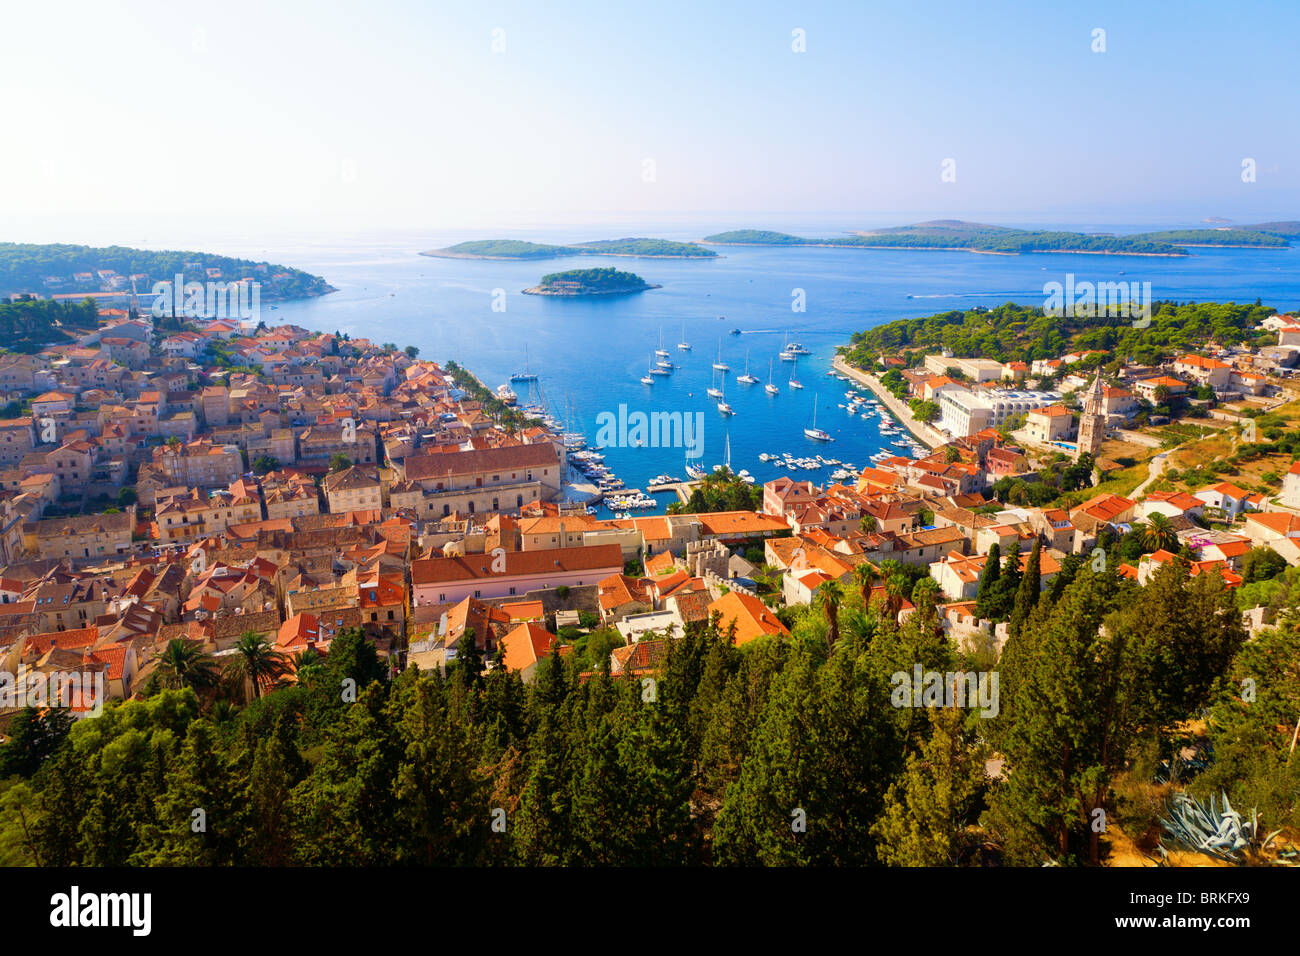 Dalmatian coast - Stock Image